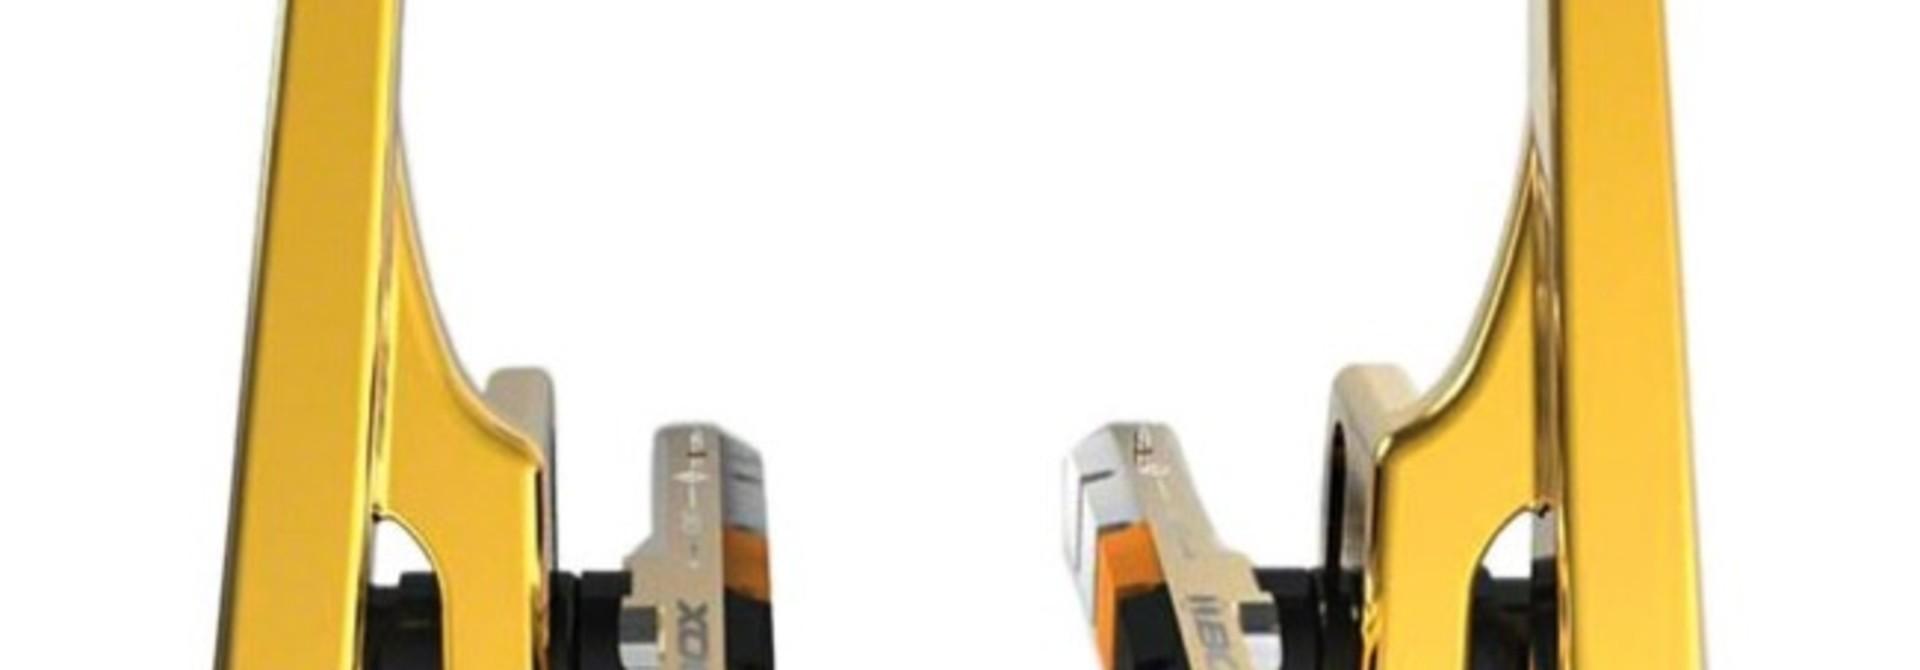 Box Eclipse V-Brakes - 108mm - Gold